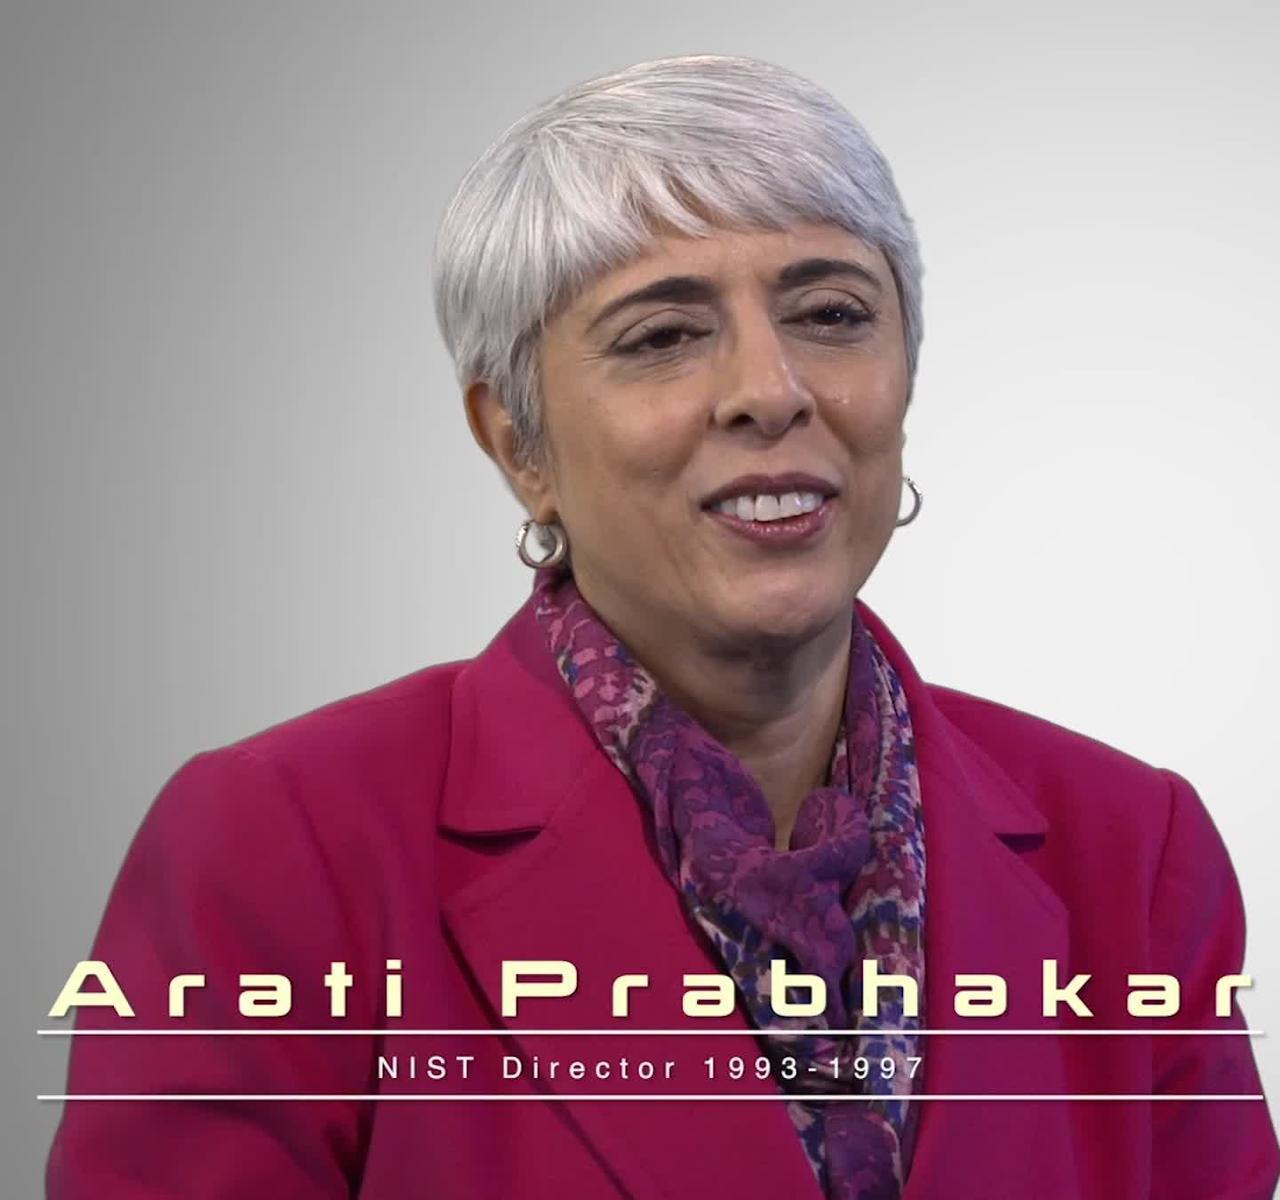 Arati Prabhakar on Why She Pursued Engineering